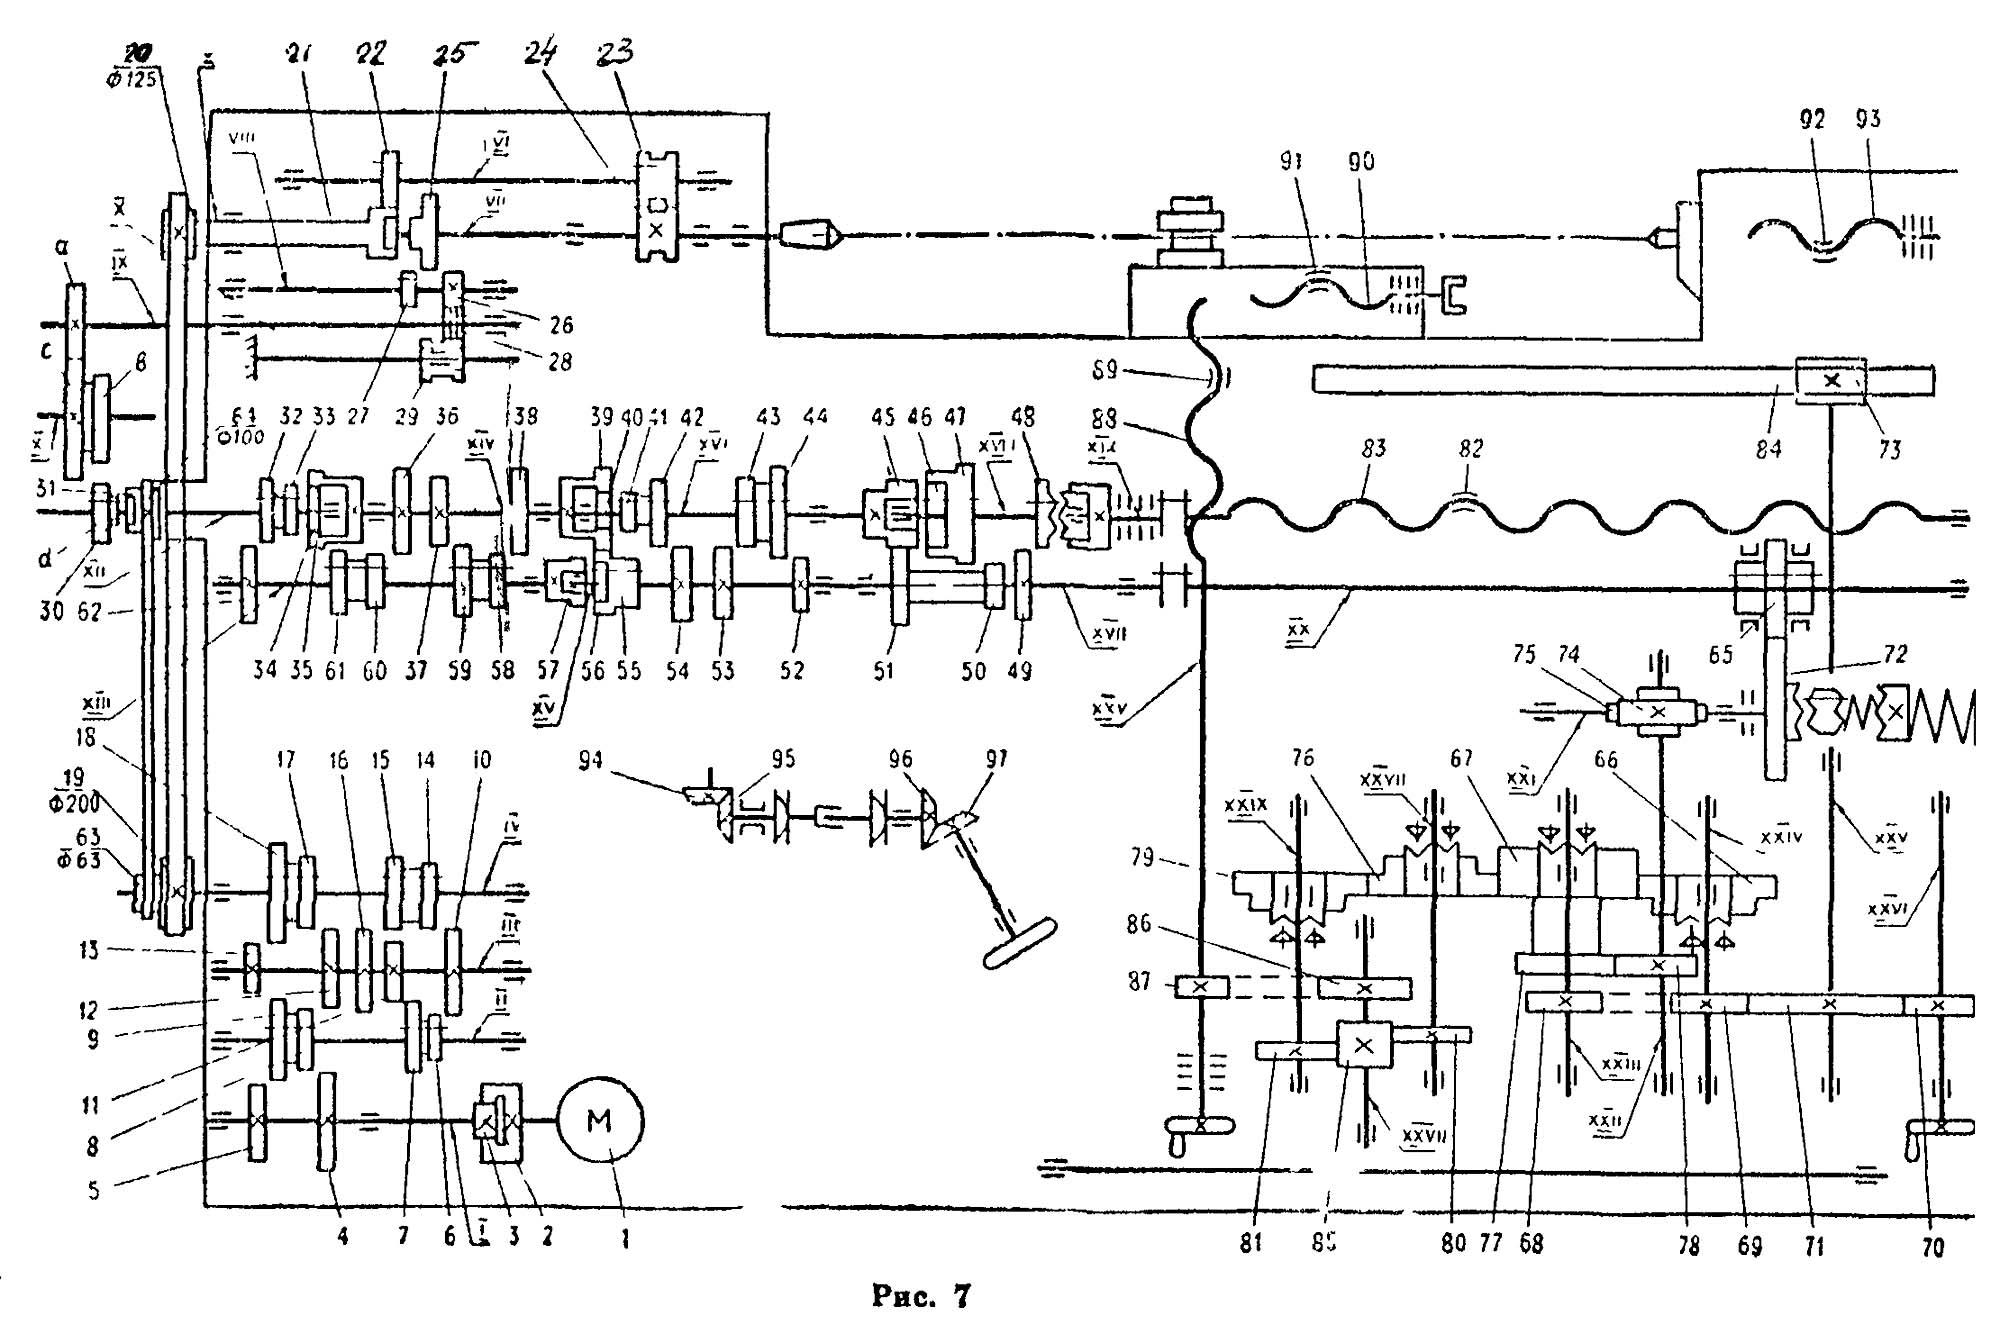 Технические характеристики токарно-винторезного станка иж-250